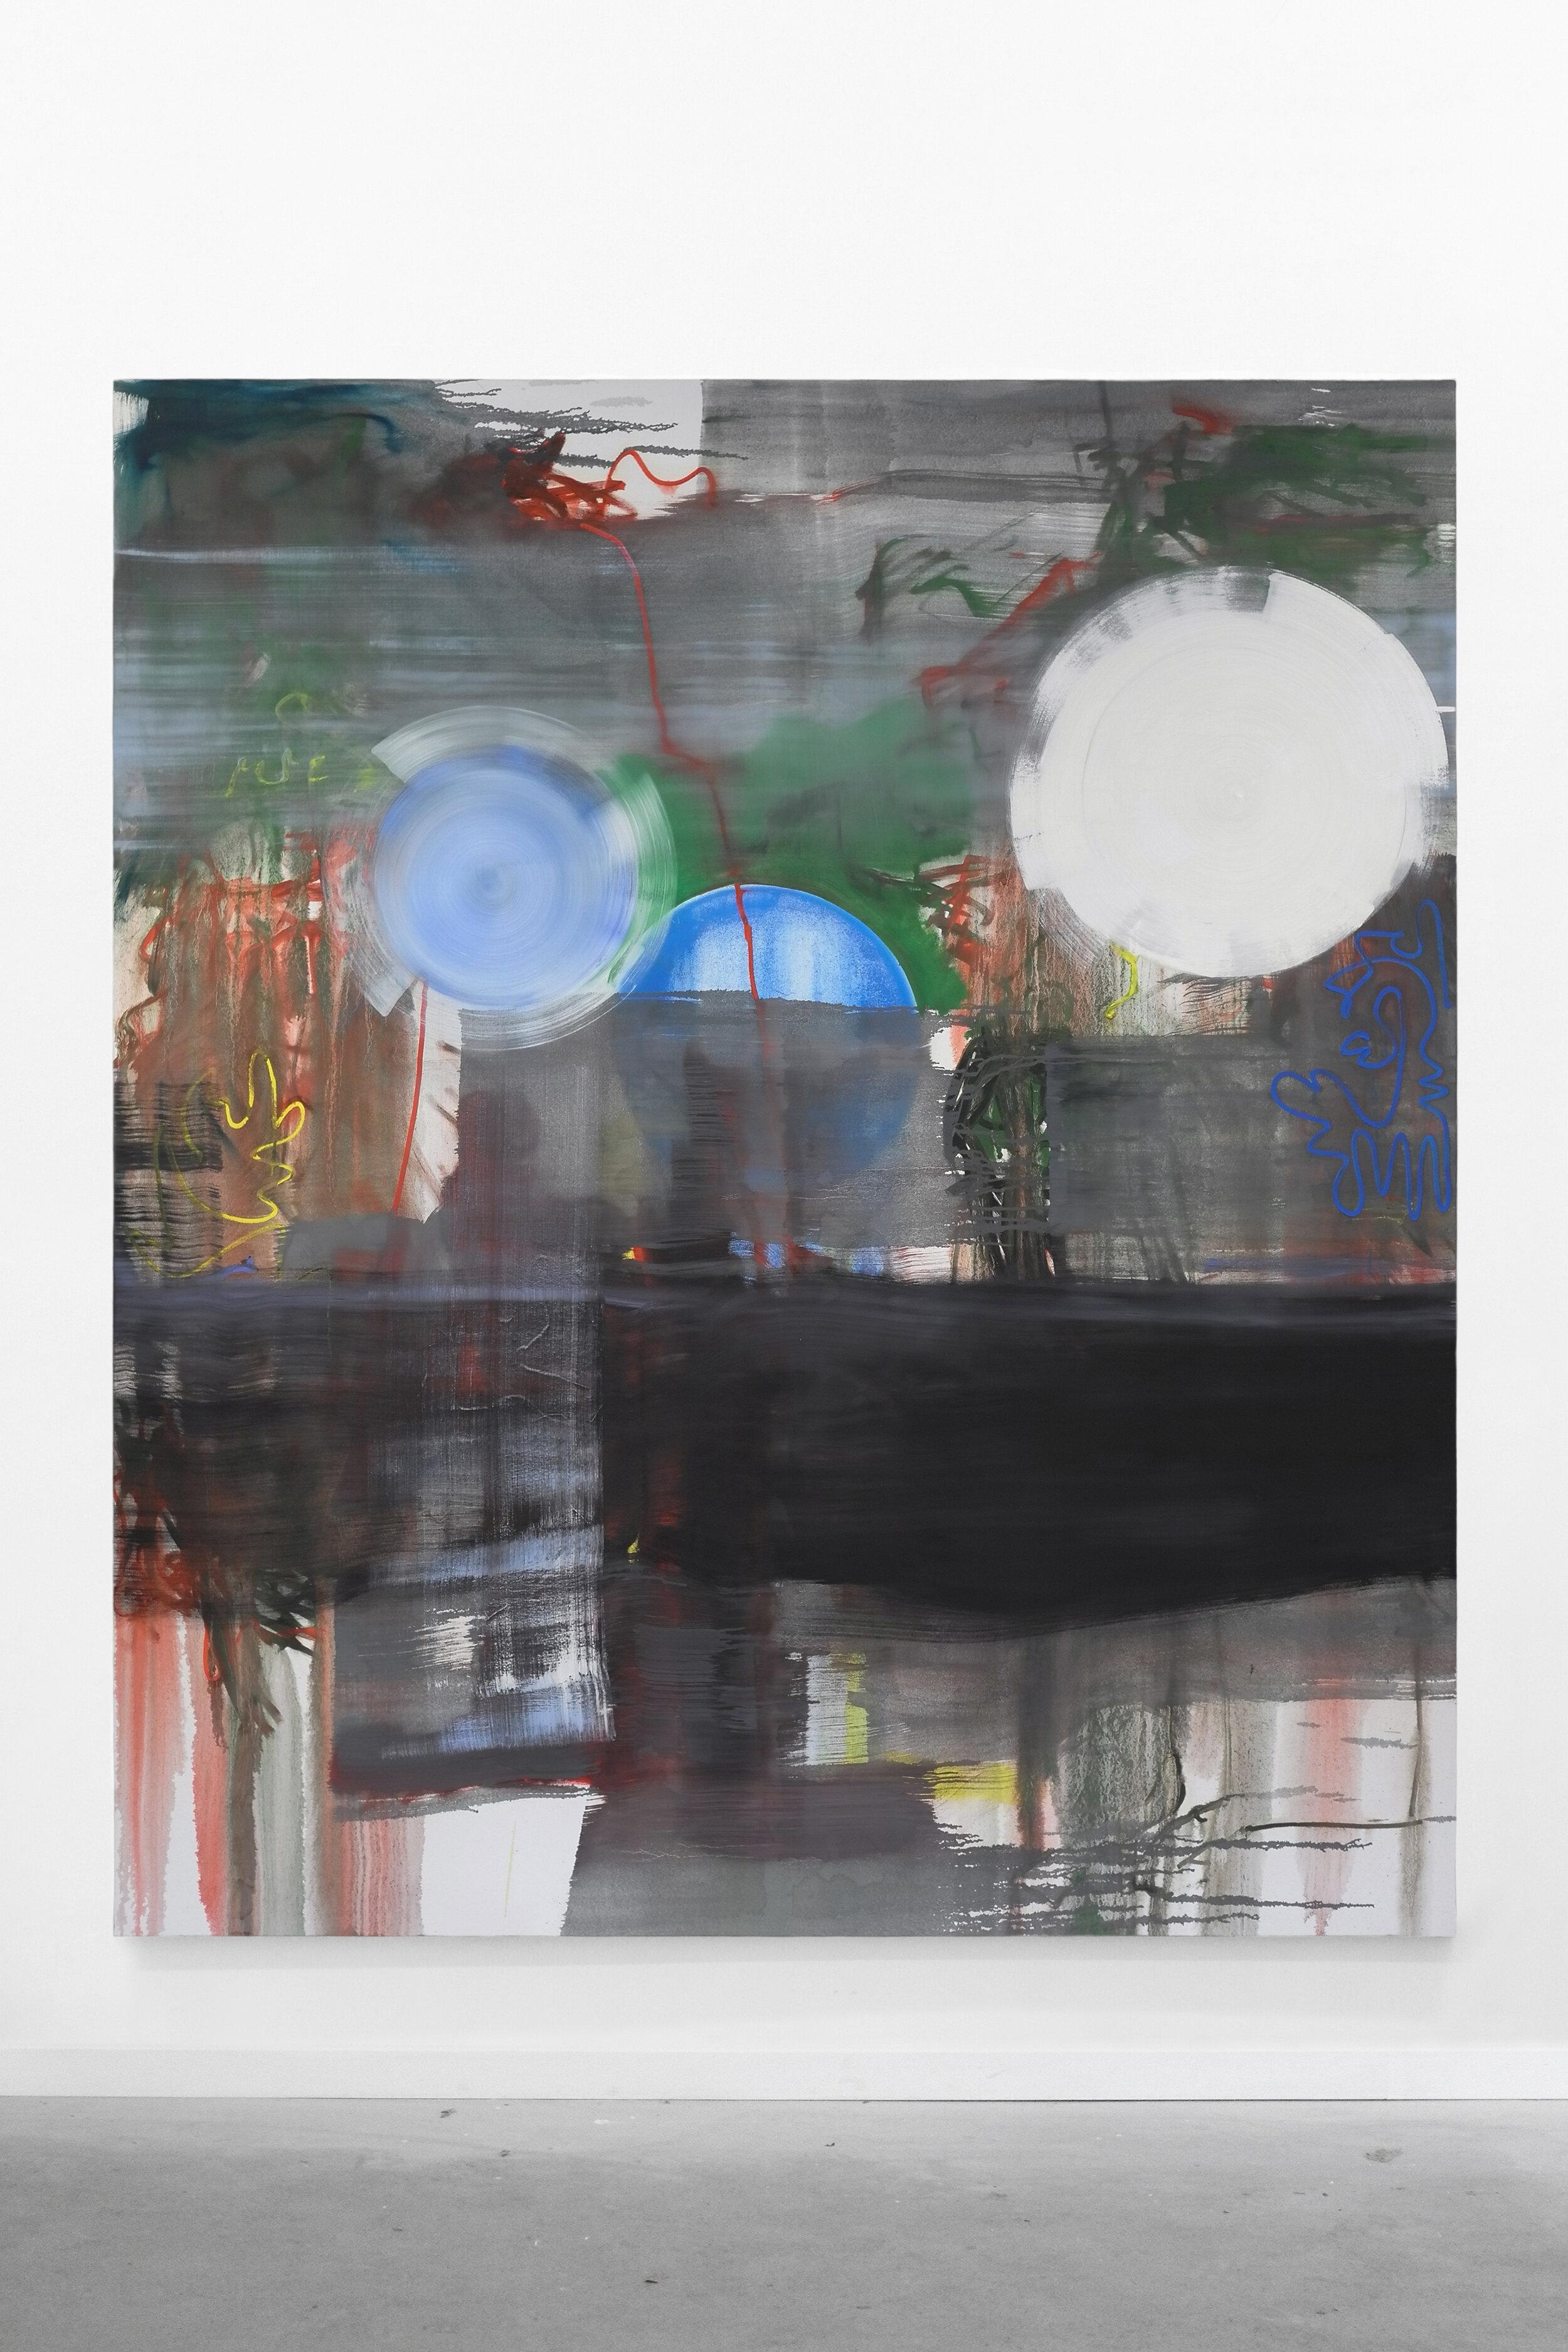 S. Derviz, Untitled, oil on canvas, 220x190cm, 2018 (1.1).jpg